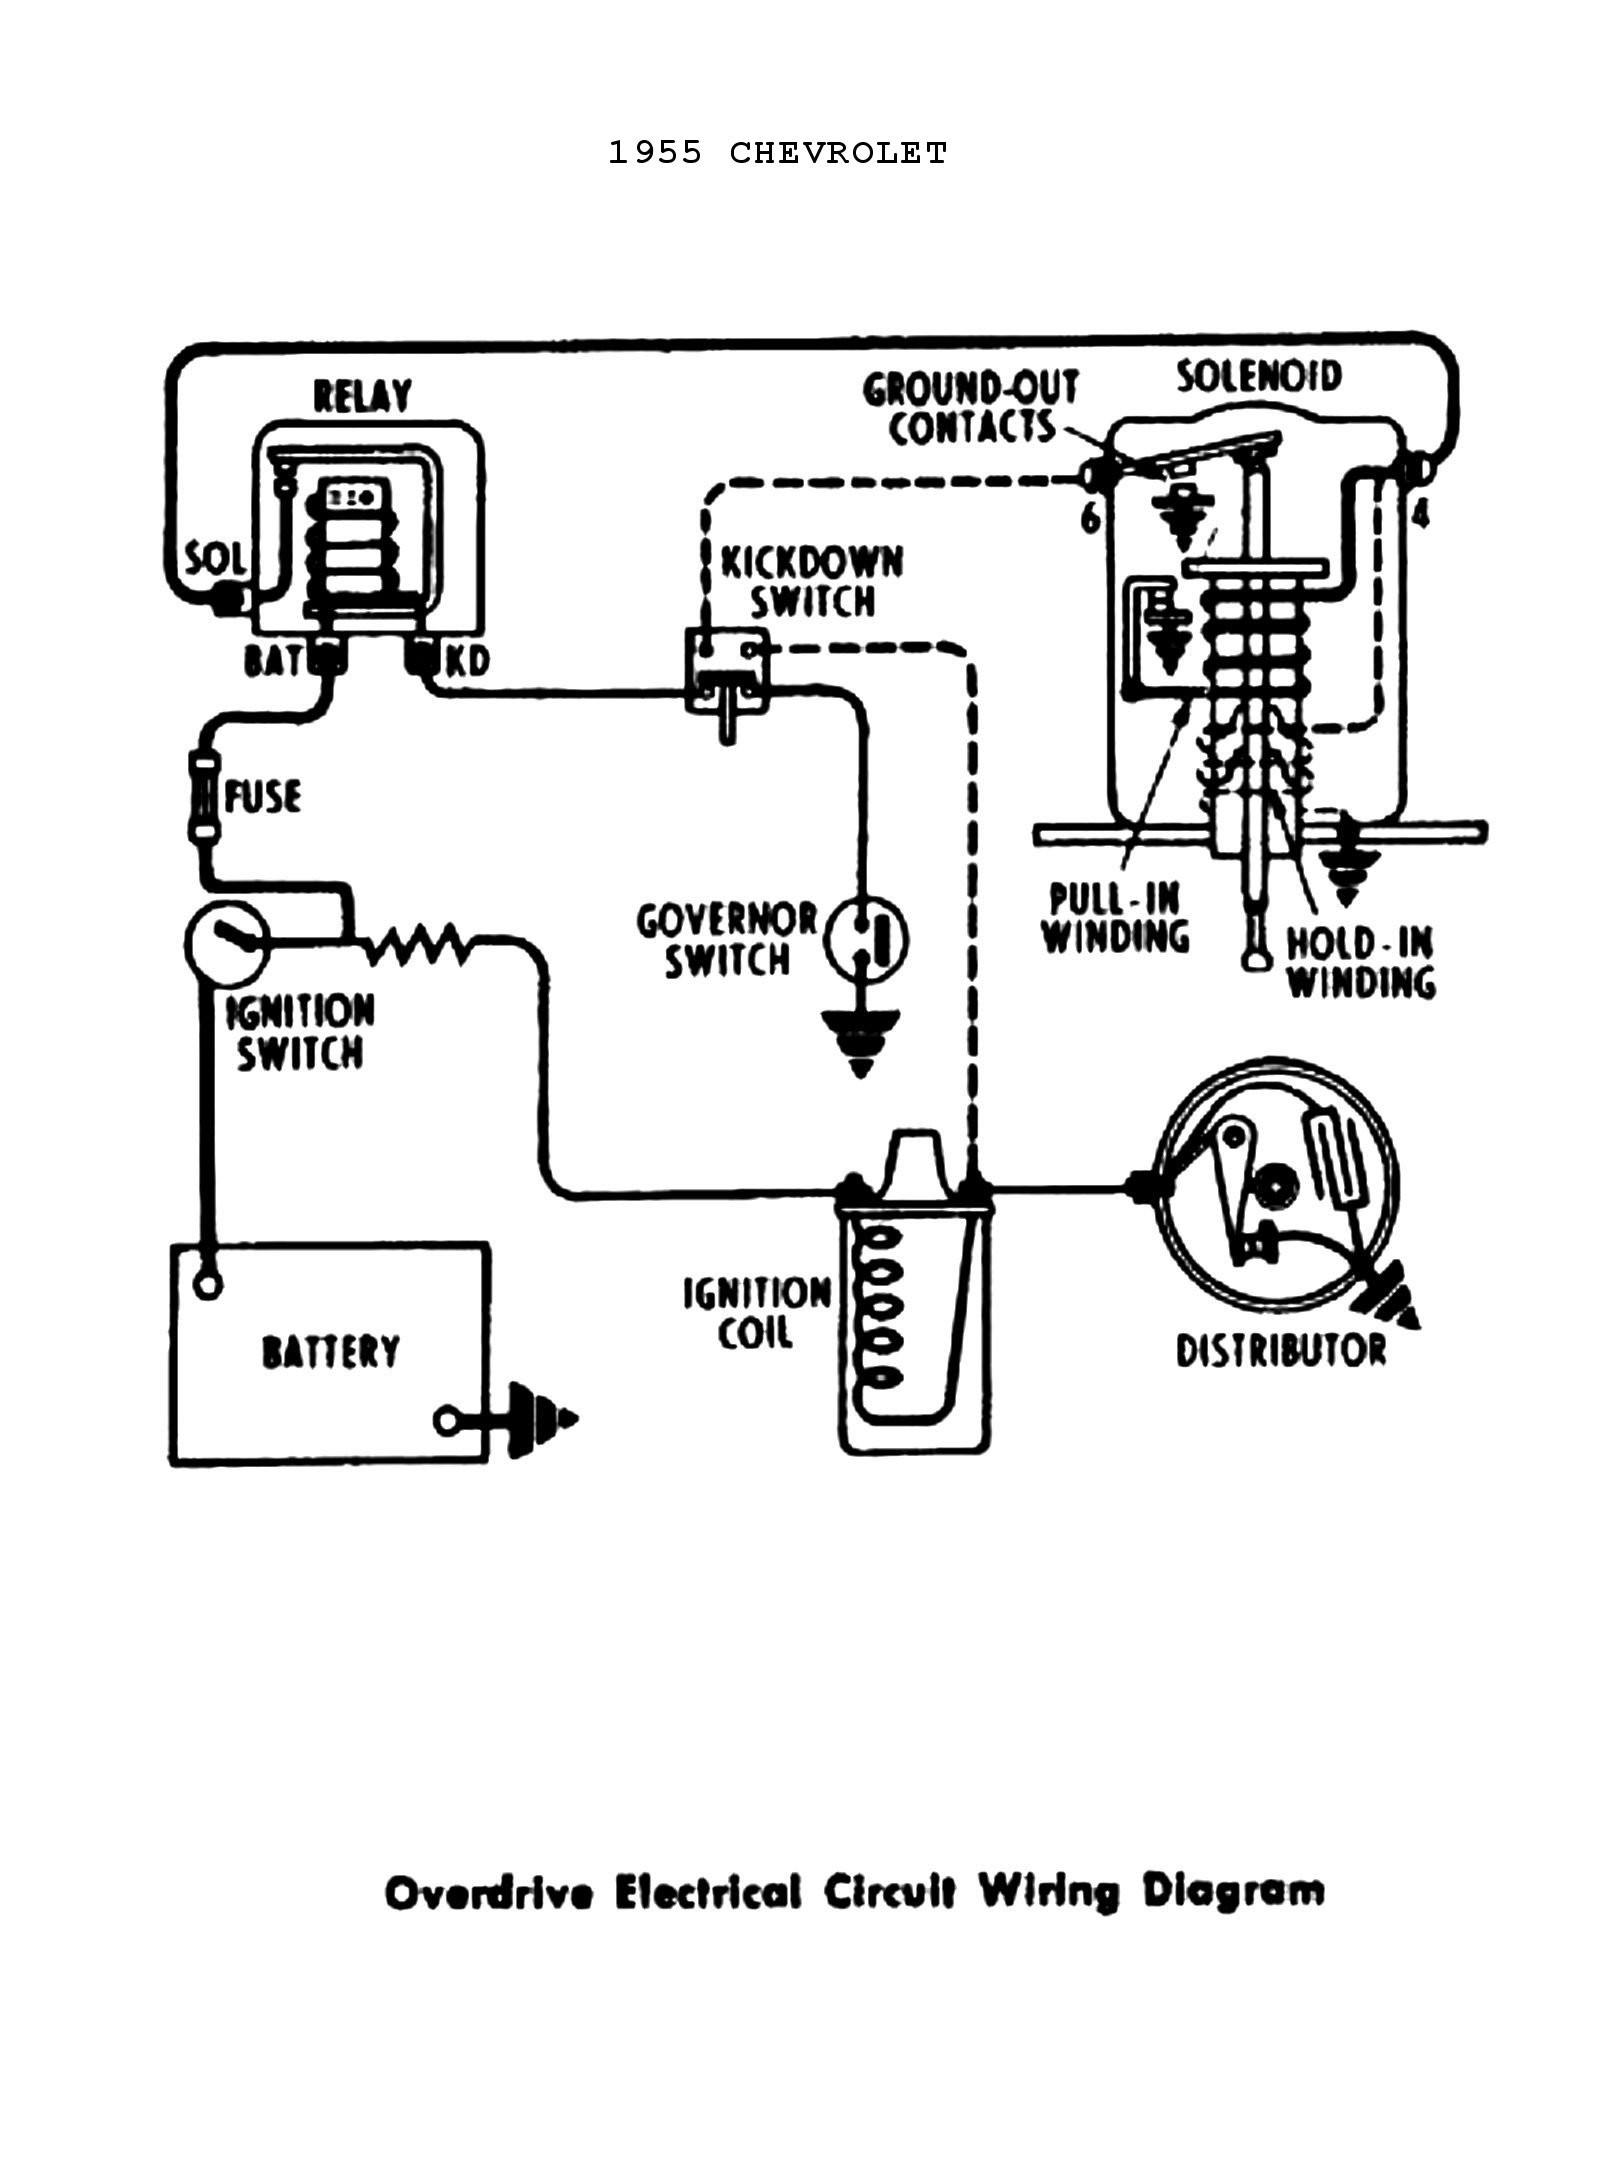 1957 chevy truck wiring diagram my wiring diagram 1957 chevy bel air wiring diagram 1957 chevy generator wiring diagram